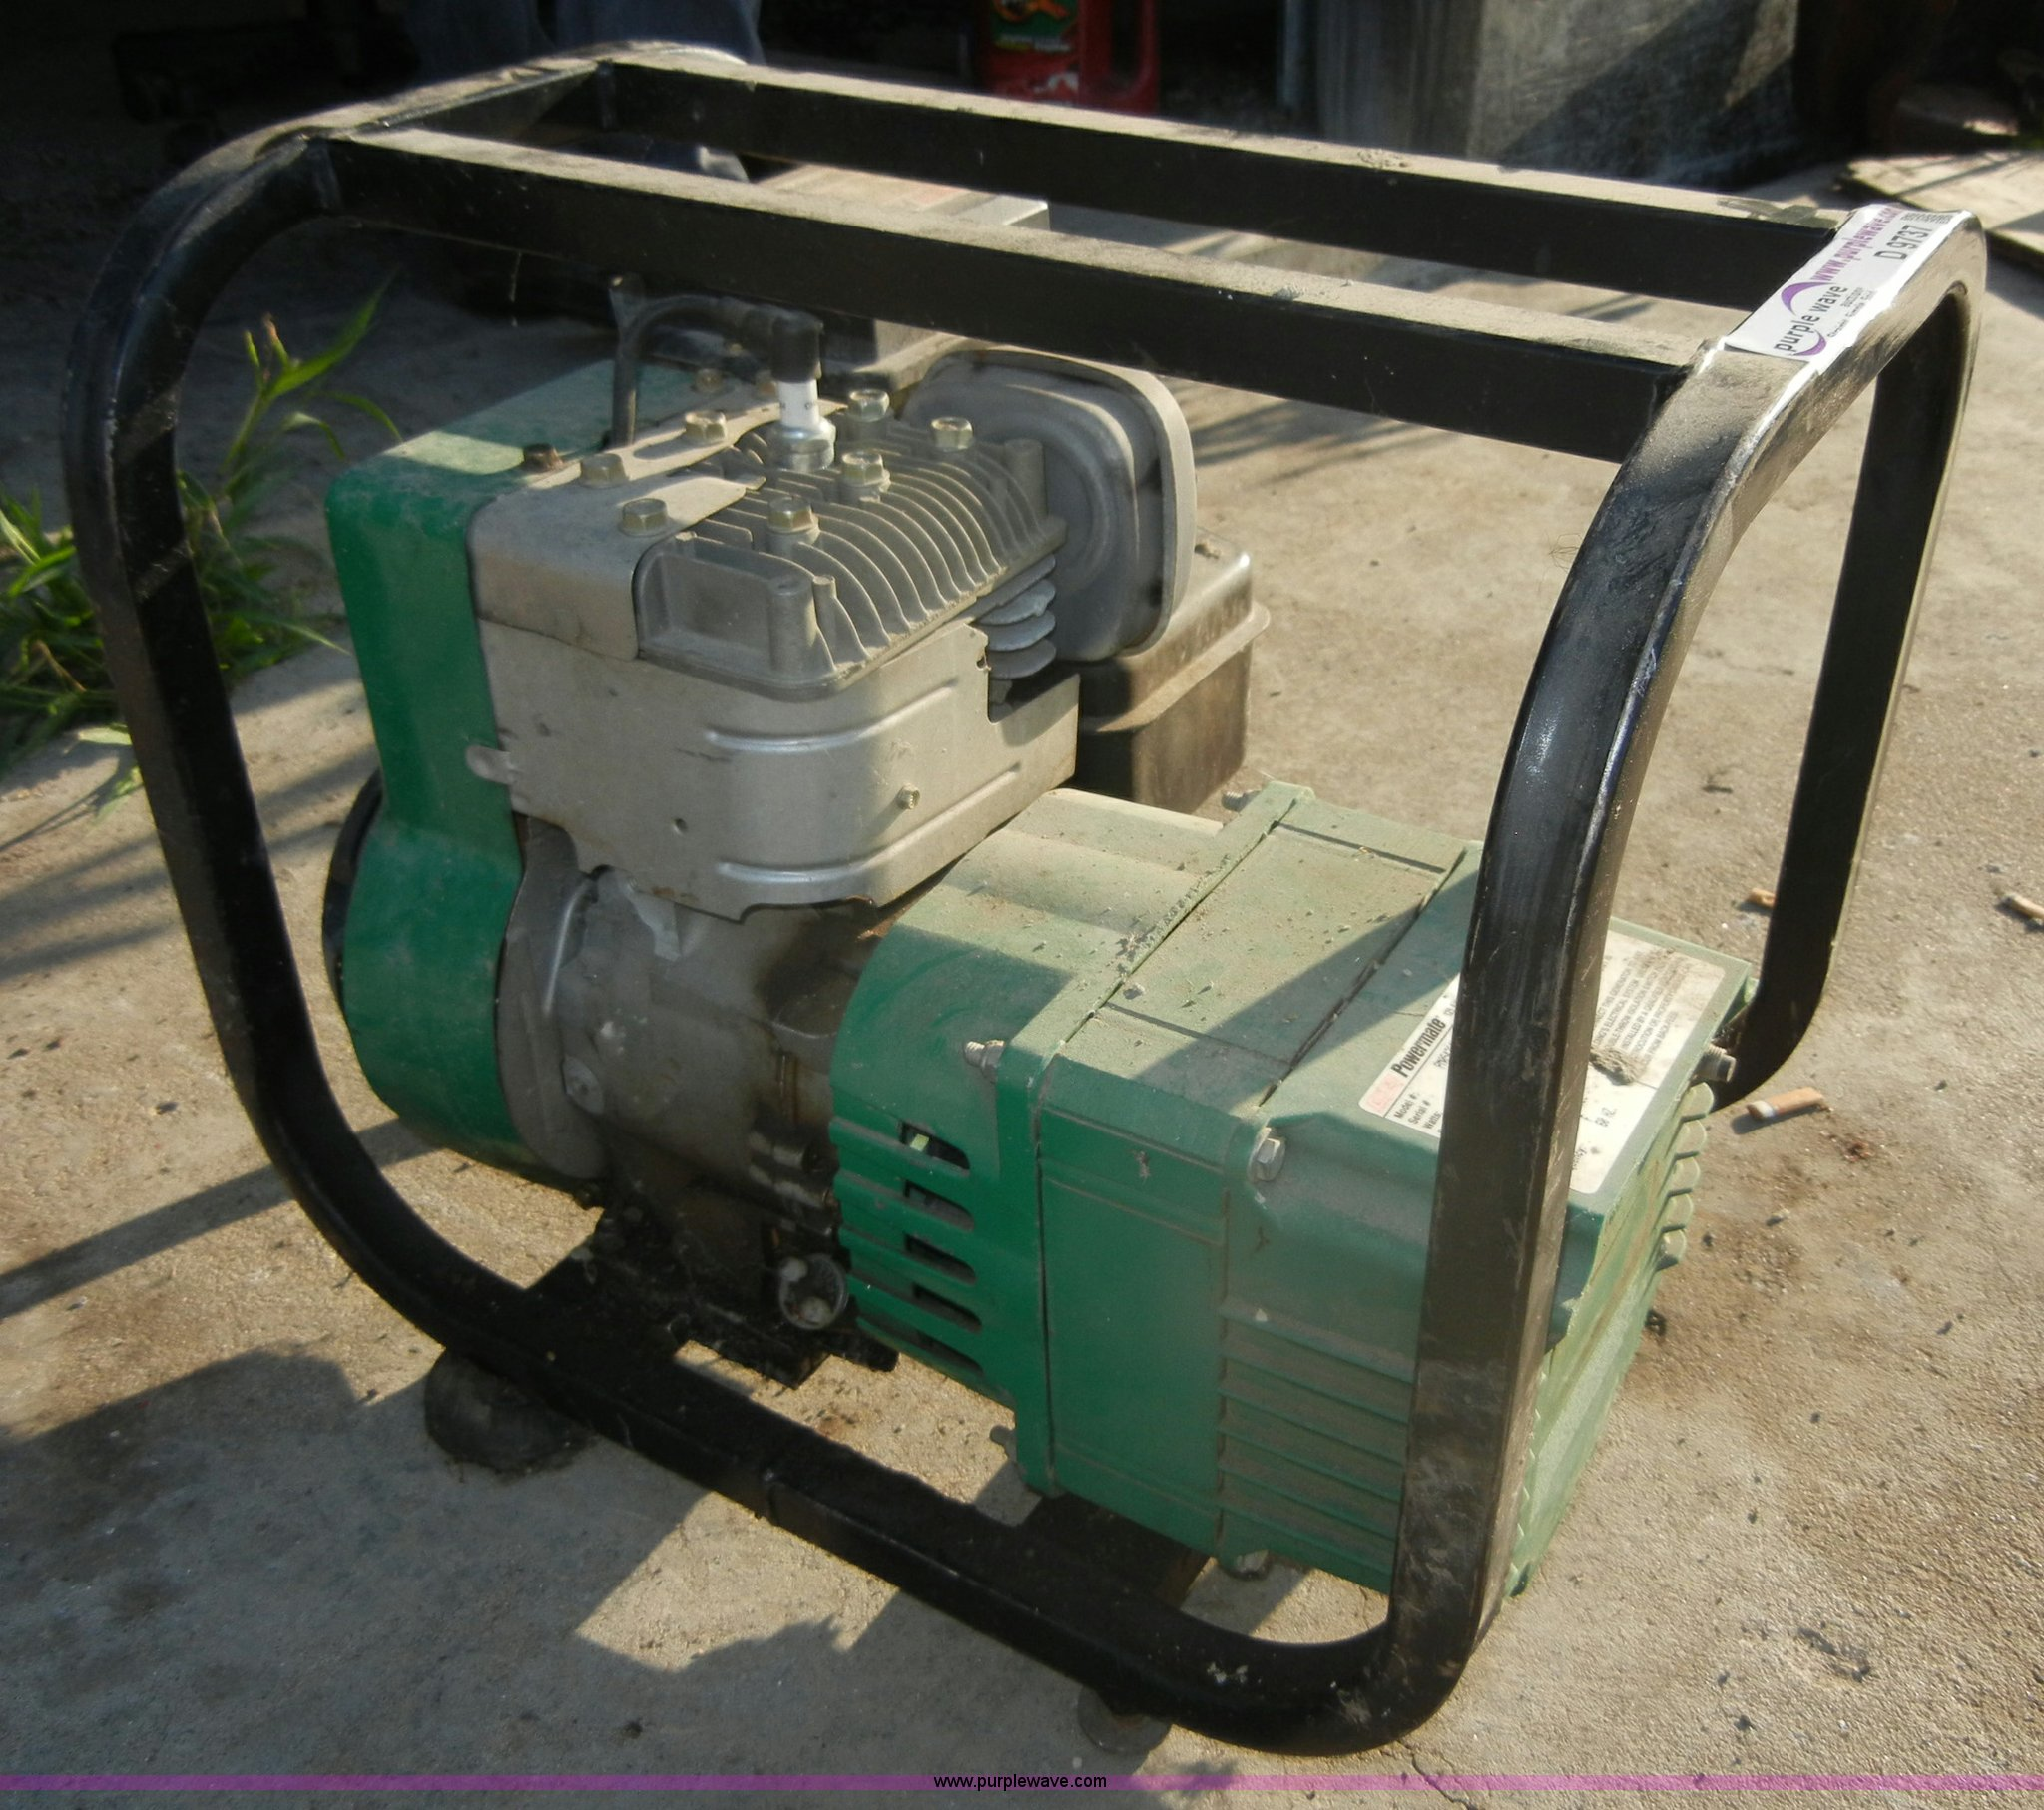 ... Coleman Powermate electric generator Full size in new window ...